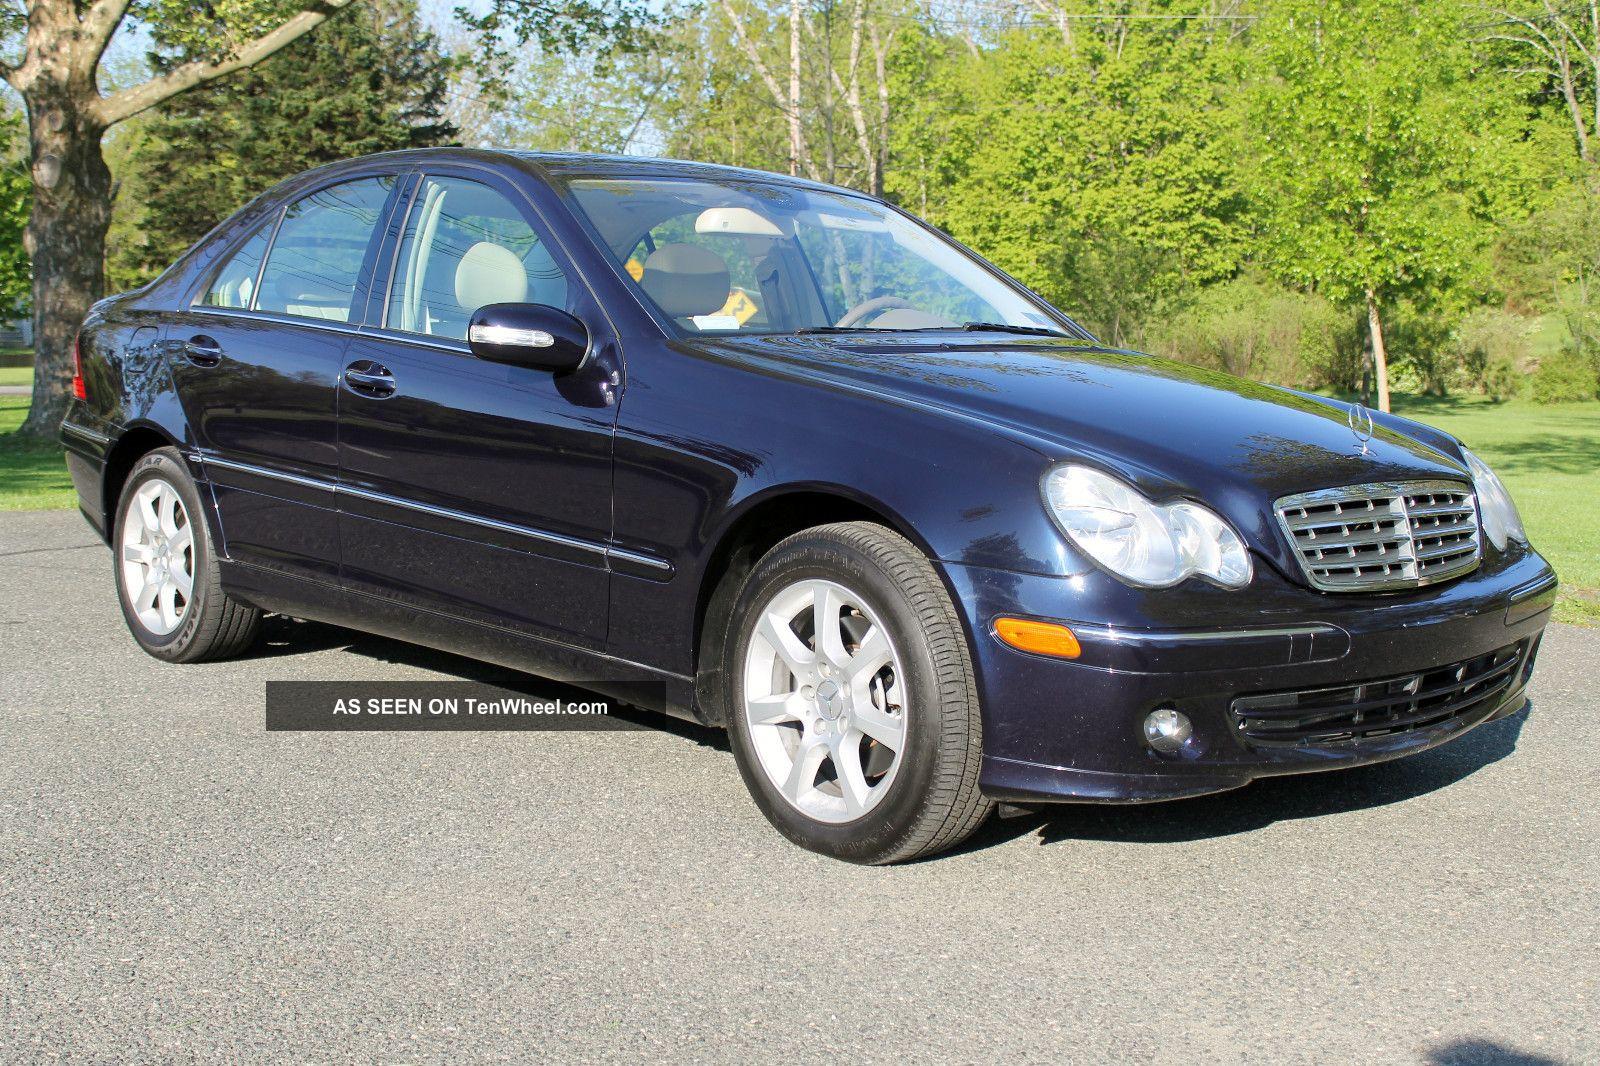 Mercedes Benz Repair Washington Dc >> 2007 Mercedes Benz C280 4matic Cars Trucks By Owner | Autos Post